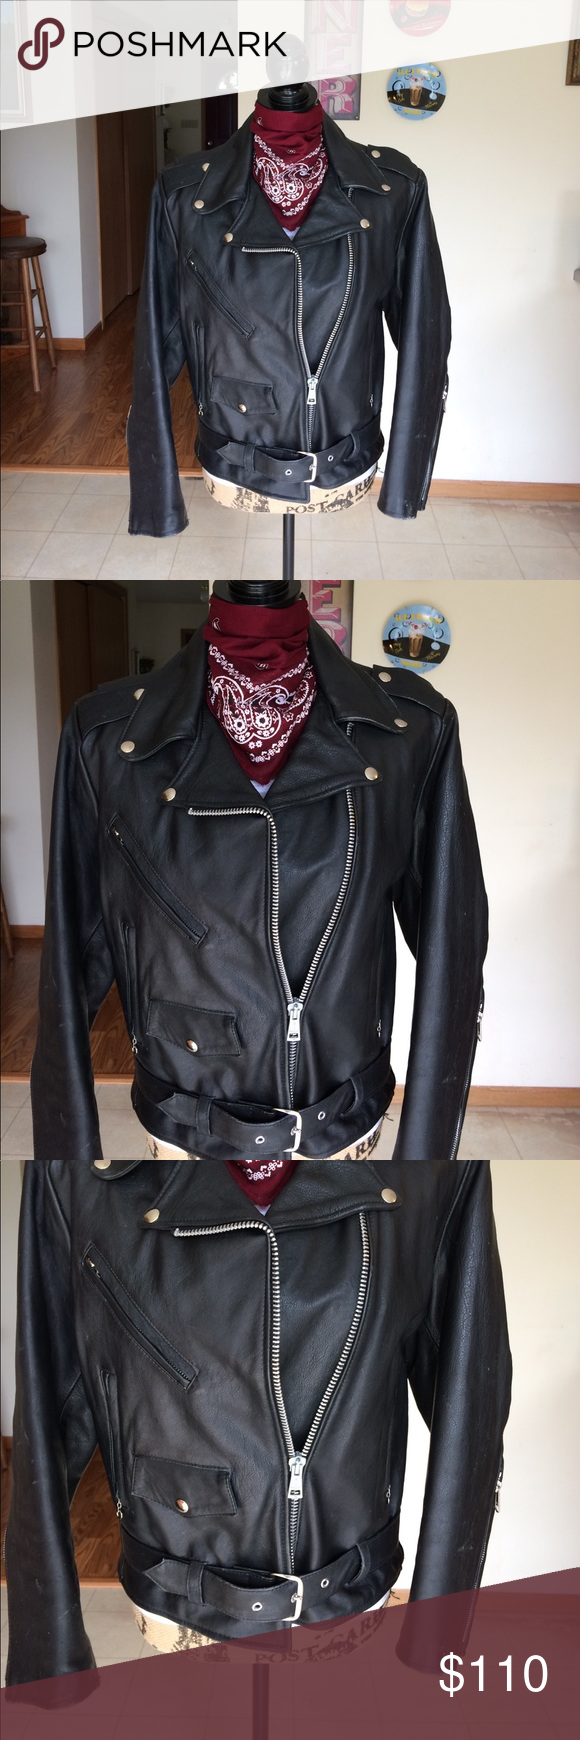 Vintage Excelled Leather Biker Jacket Here Is A Very Vintage Leather Biker Jacket Dates To The Sixties Ladies Siz Clothes Design Leather Biker Jacket Jackets [ 1740 x 580 Pixel ]